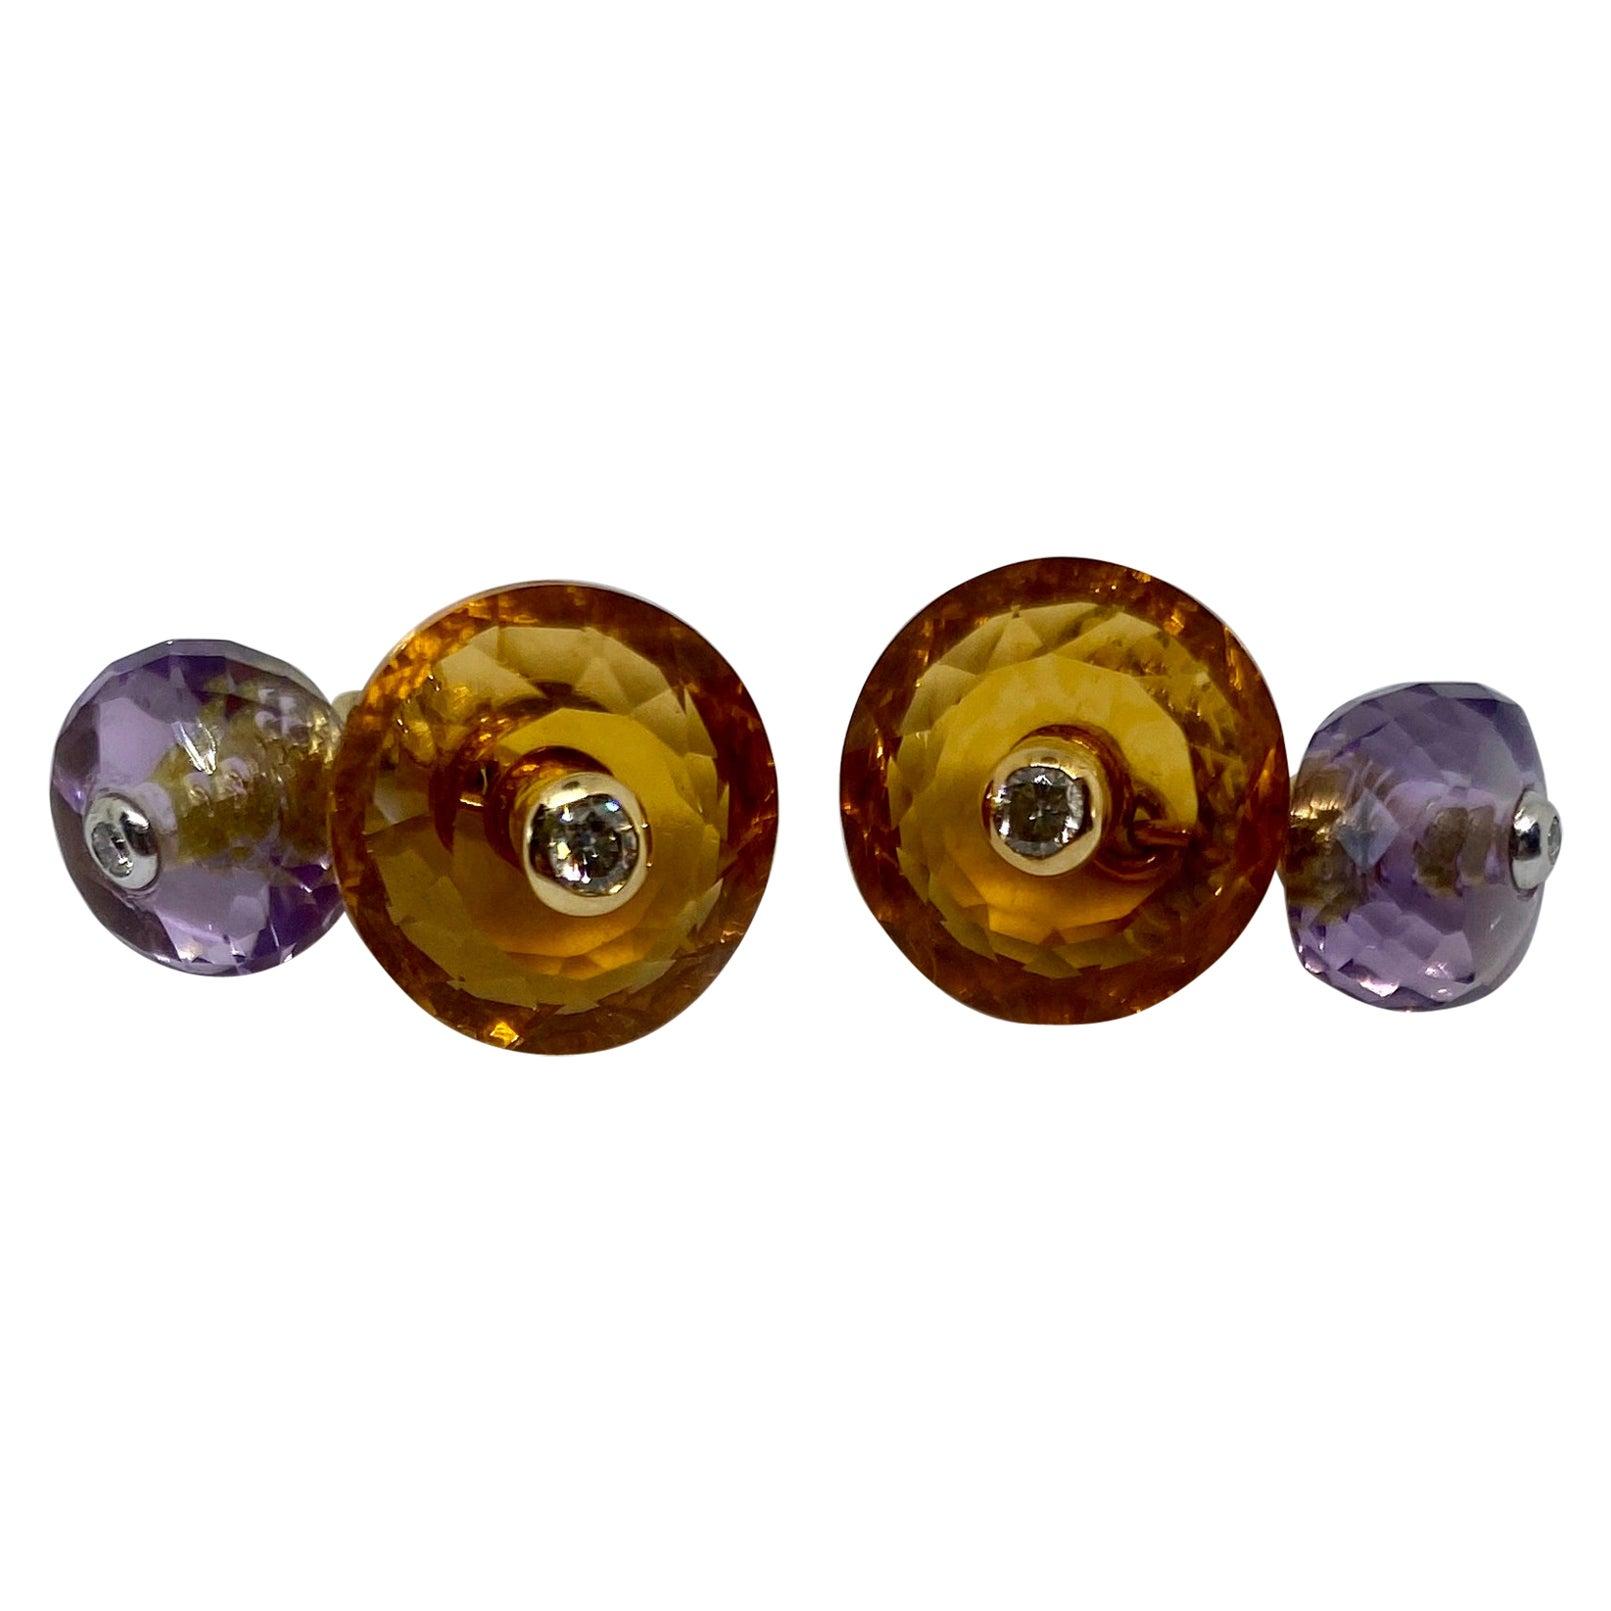 18 Karat Gold, Madera Citrine, Amethyst and Diamond Cufflinks